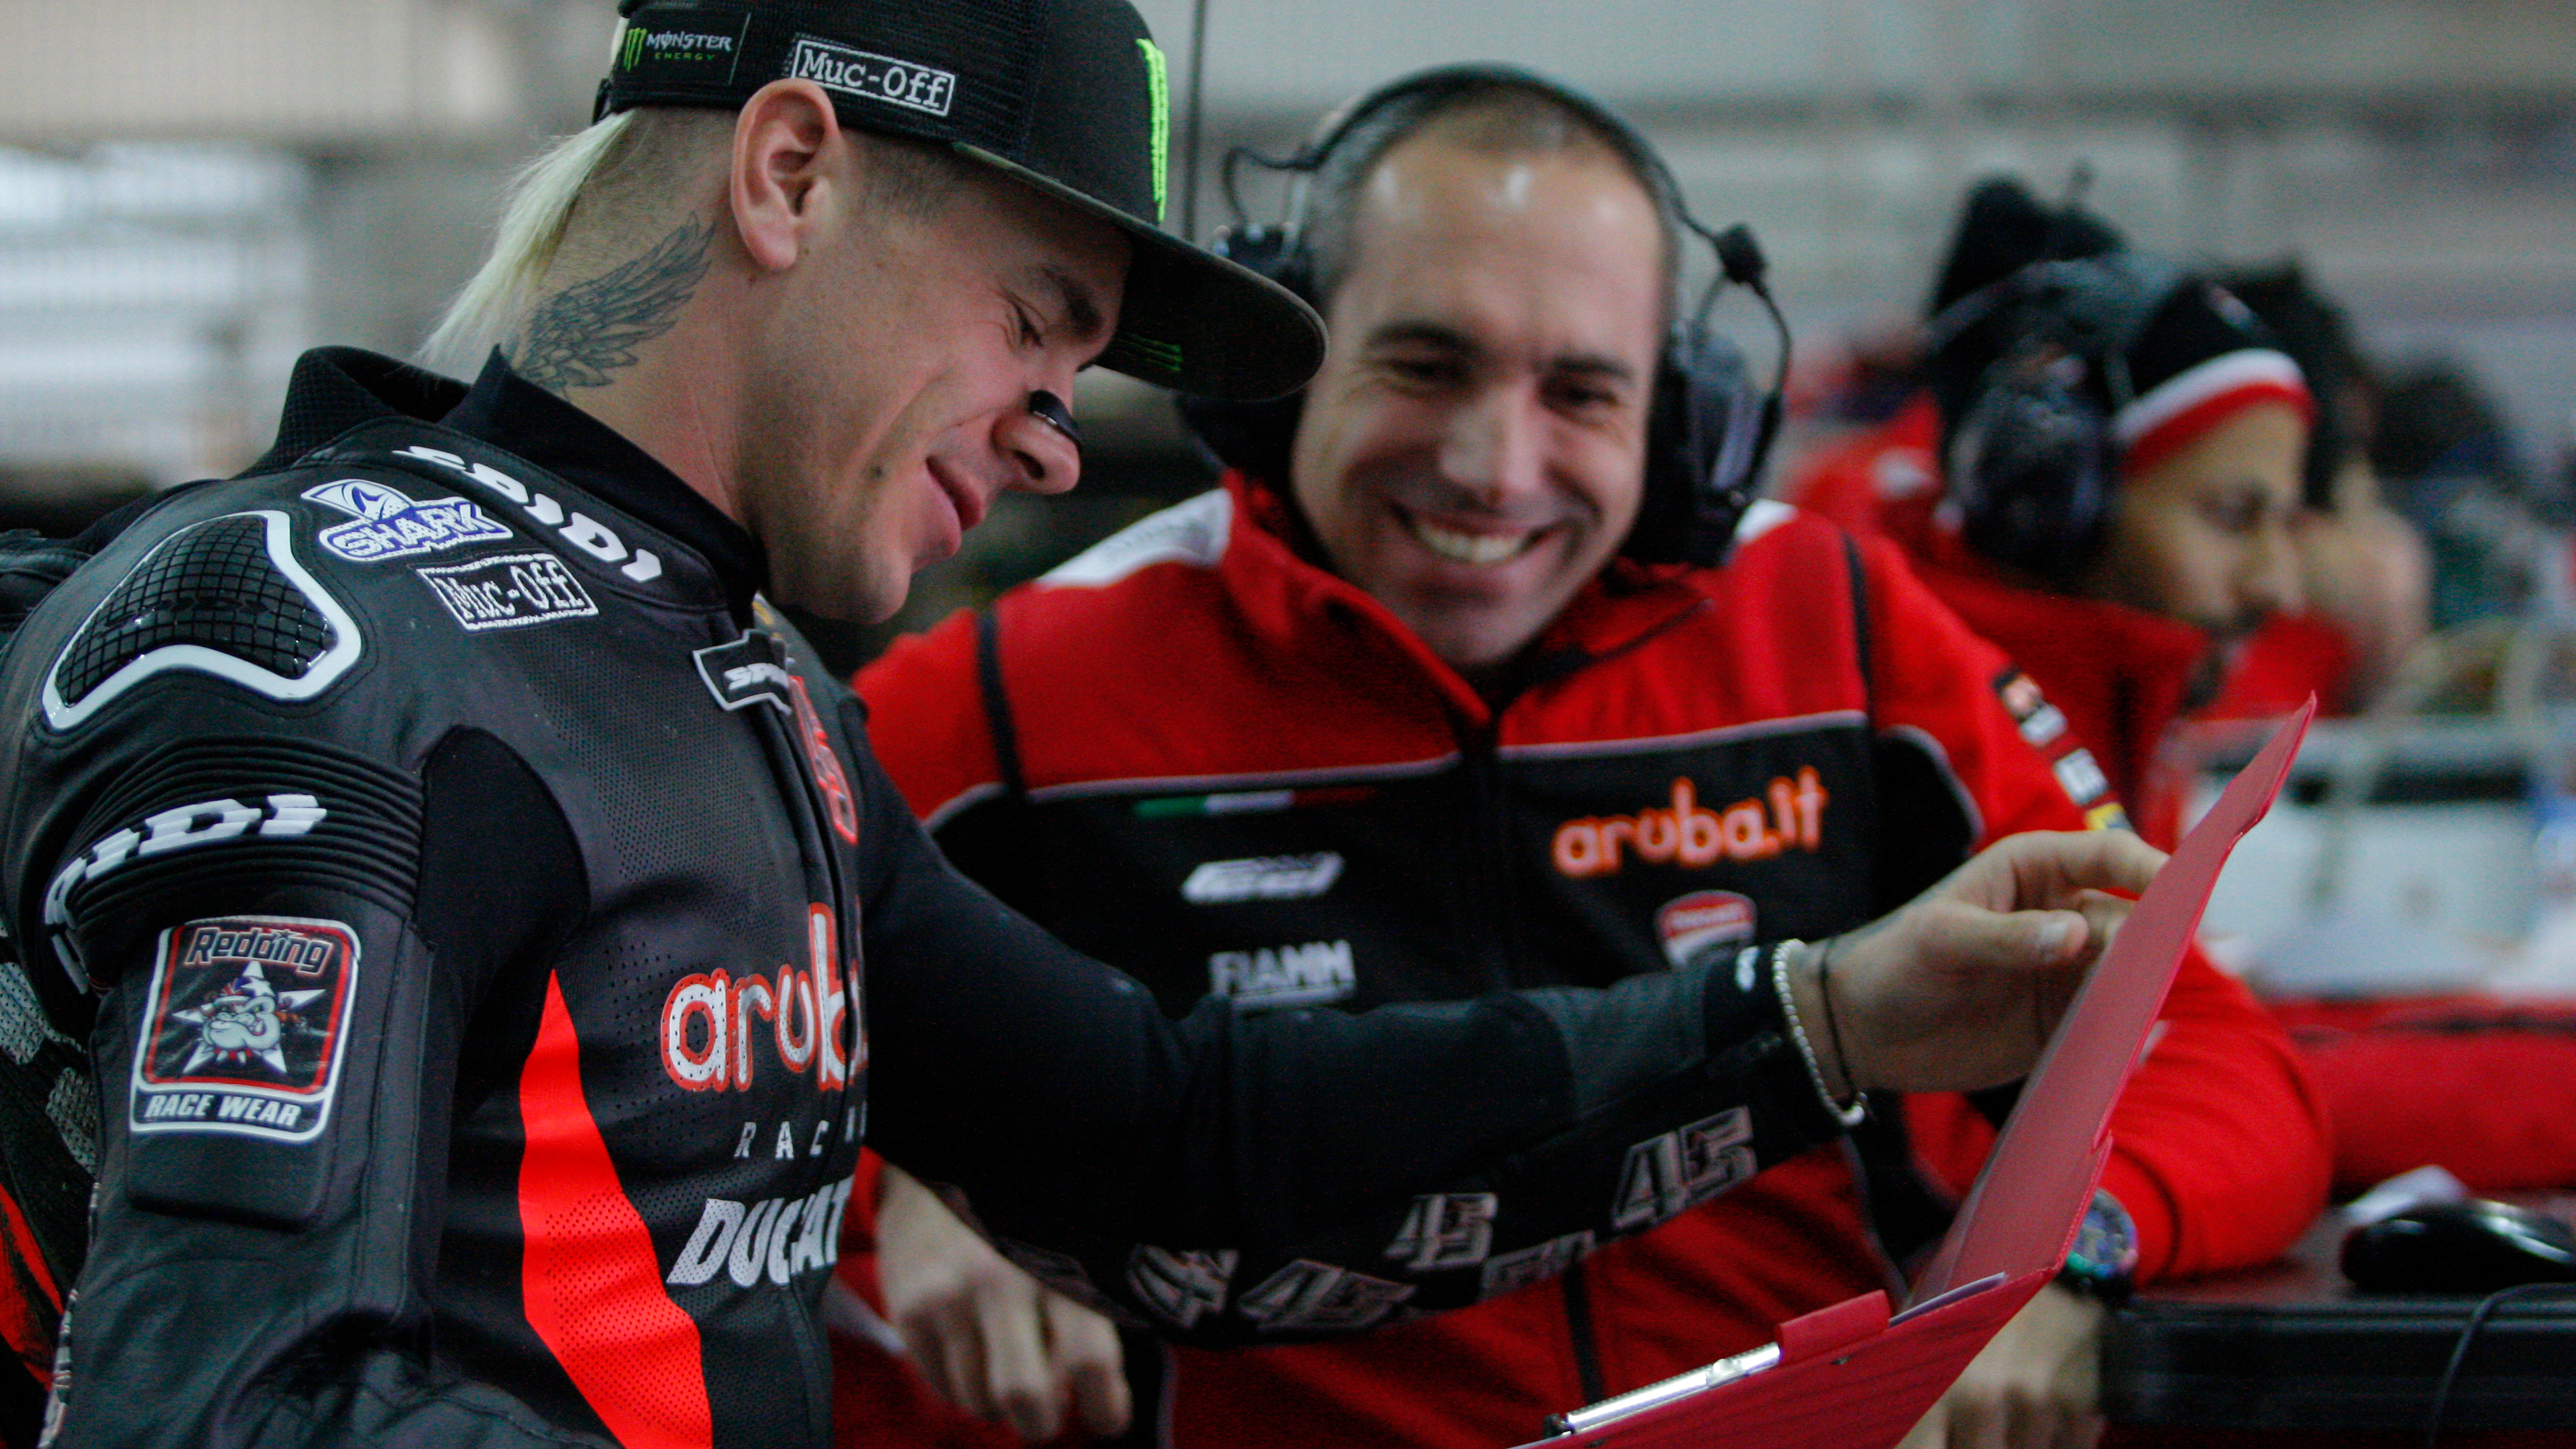 SBK, 2020: Redding traz o seu técnico chefe para a Ducati